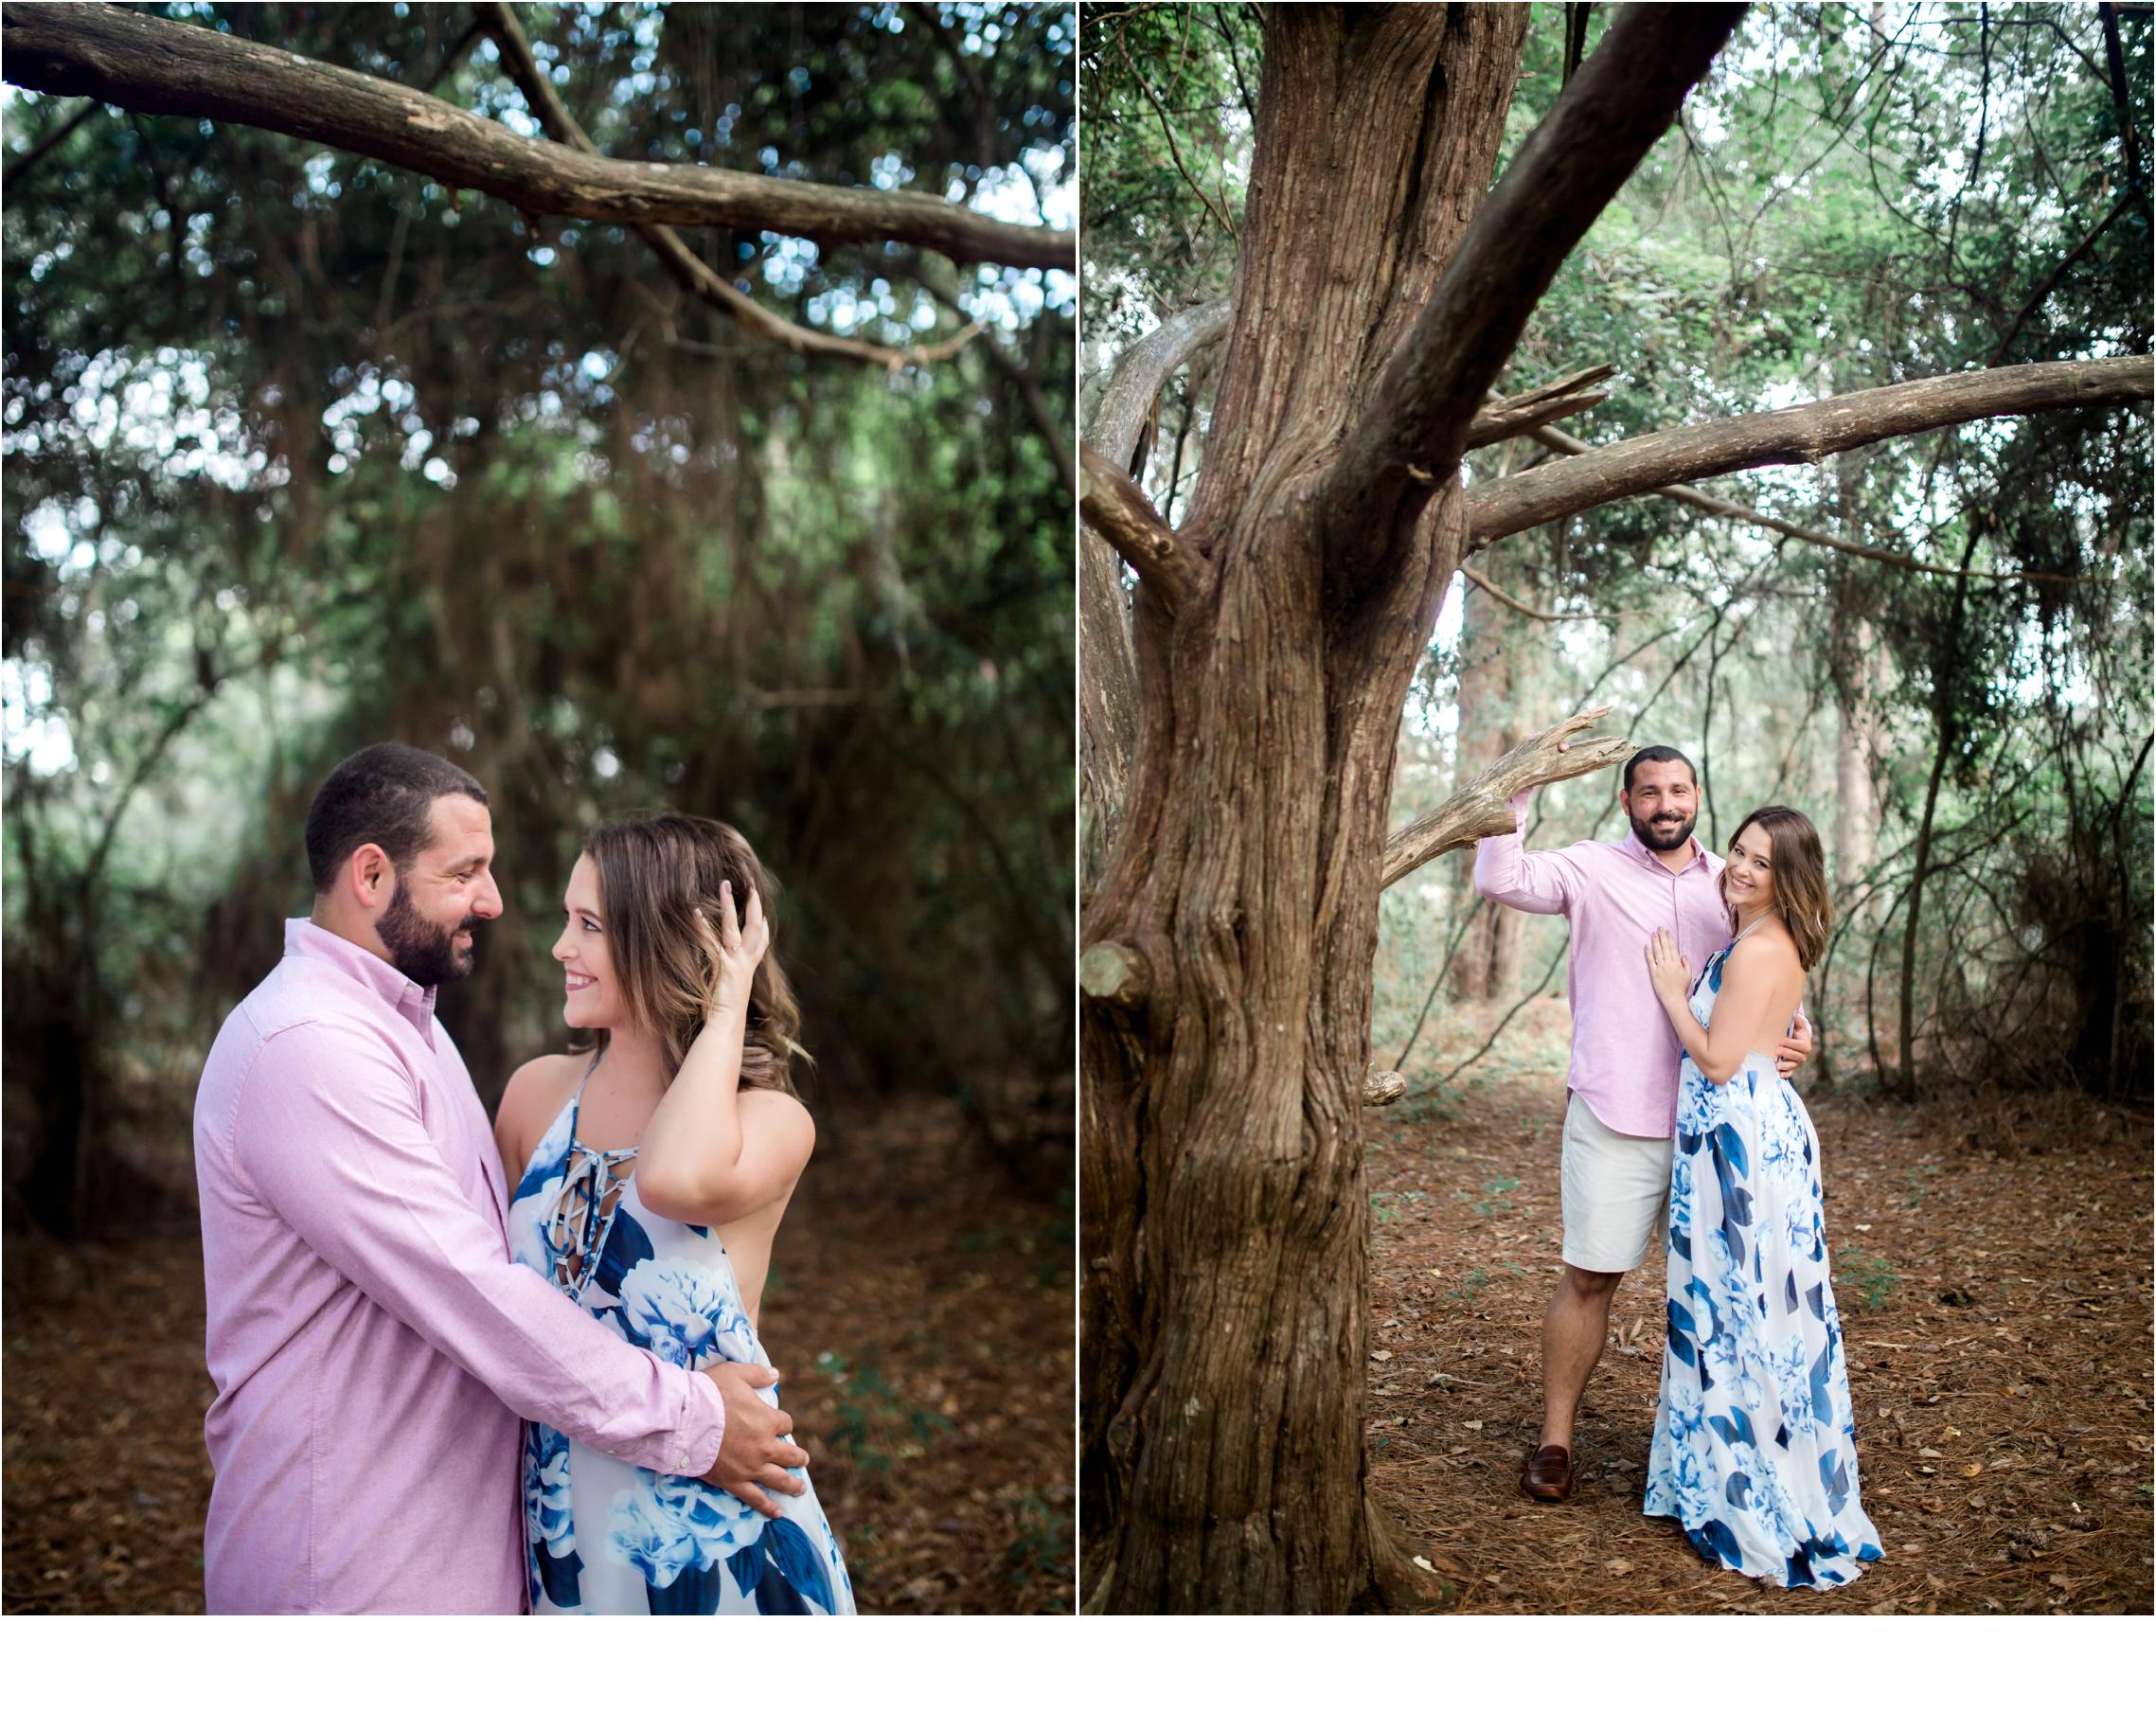 Rainey_Gregg_Photography_St._Simons_Island_Georgia_California_Wedding_Portrait_Photography_0137.jpg